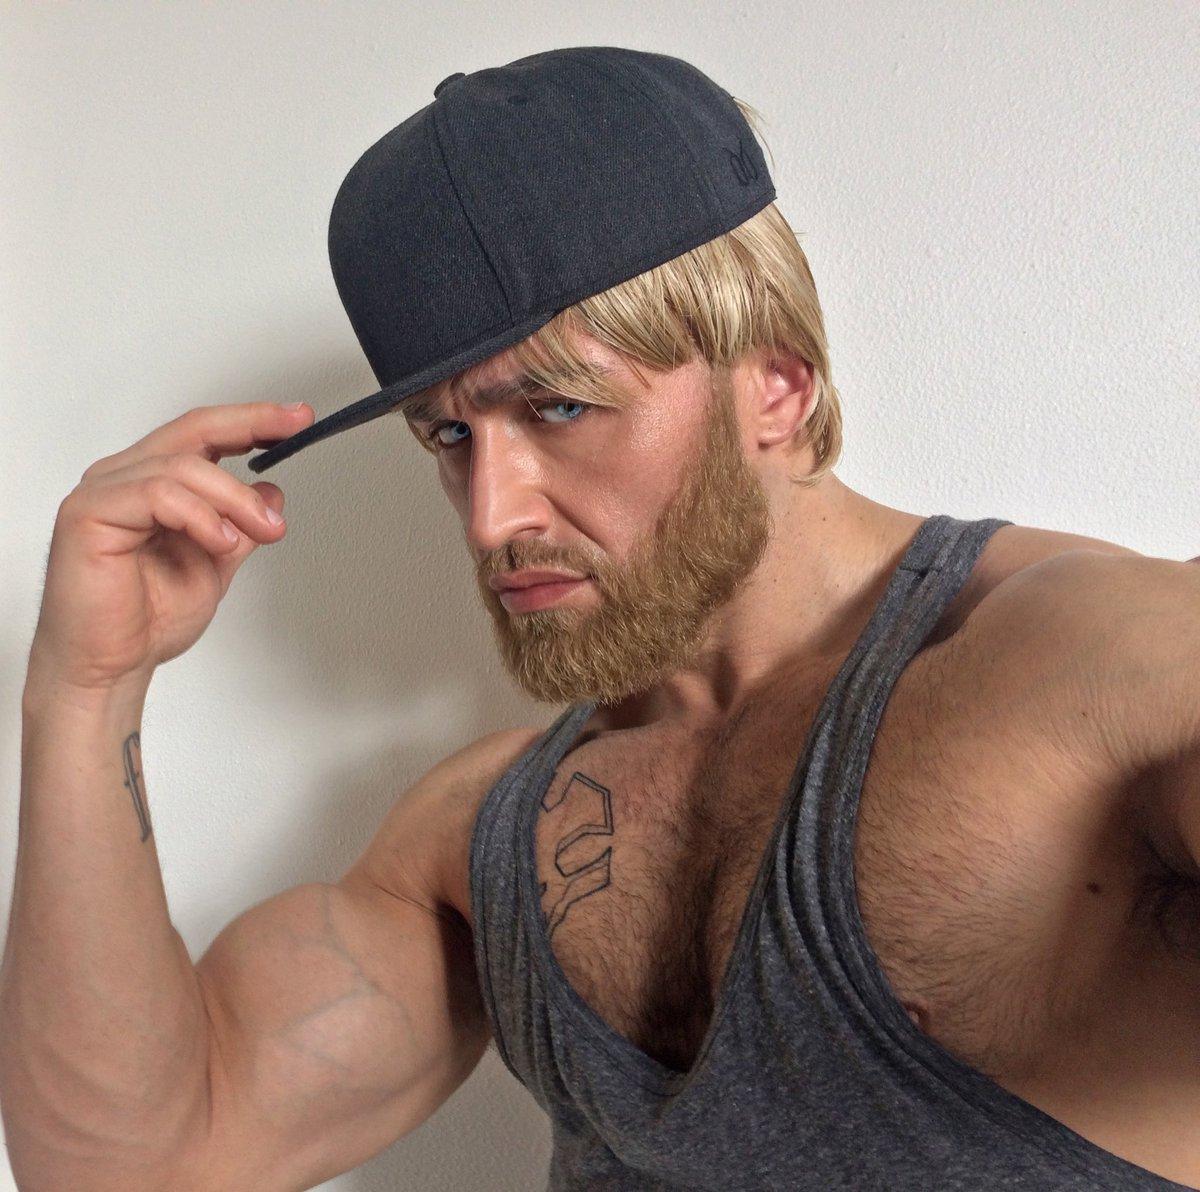 larry craig announces gay